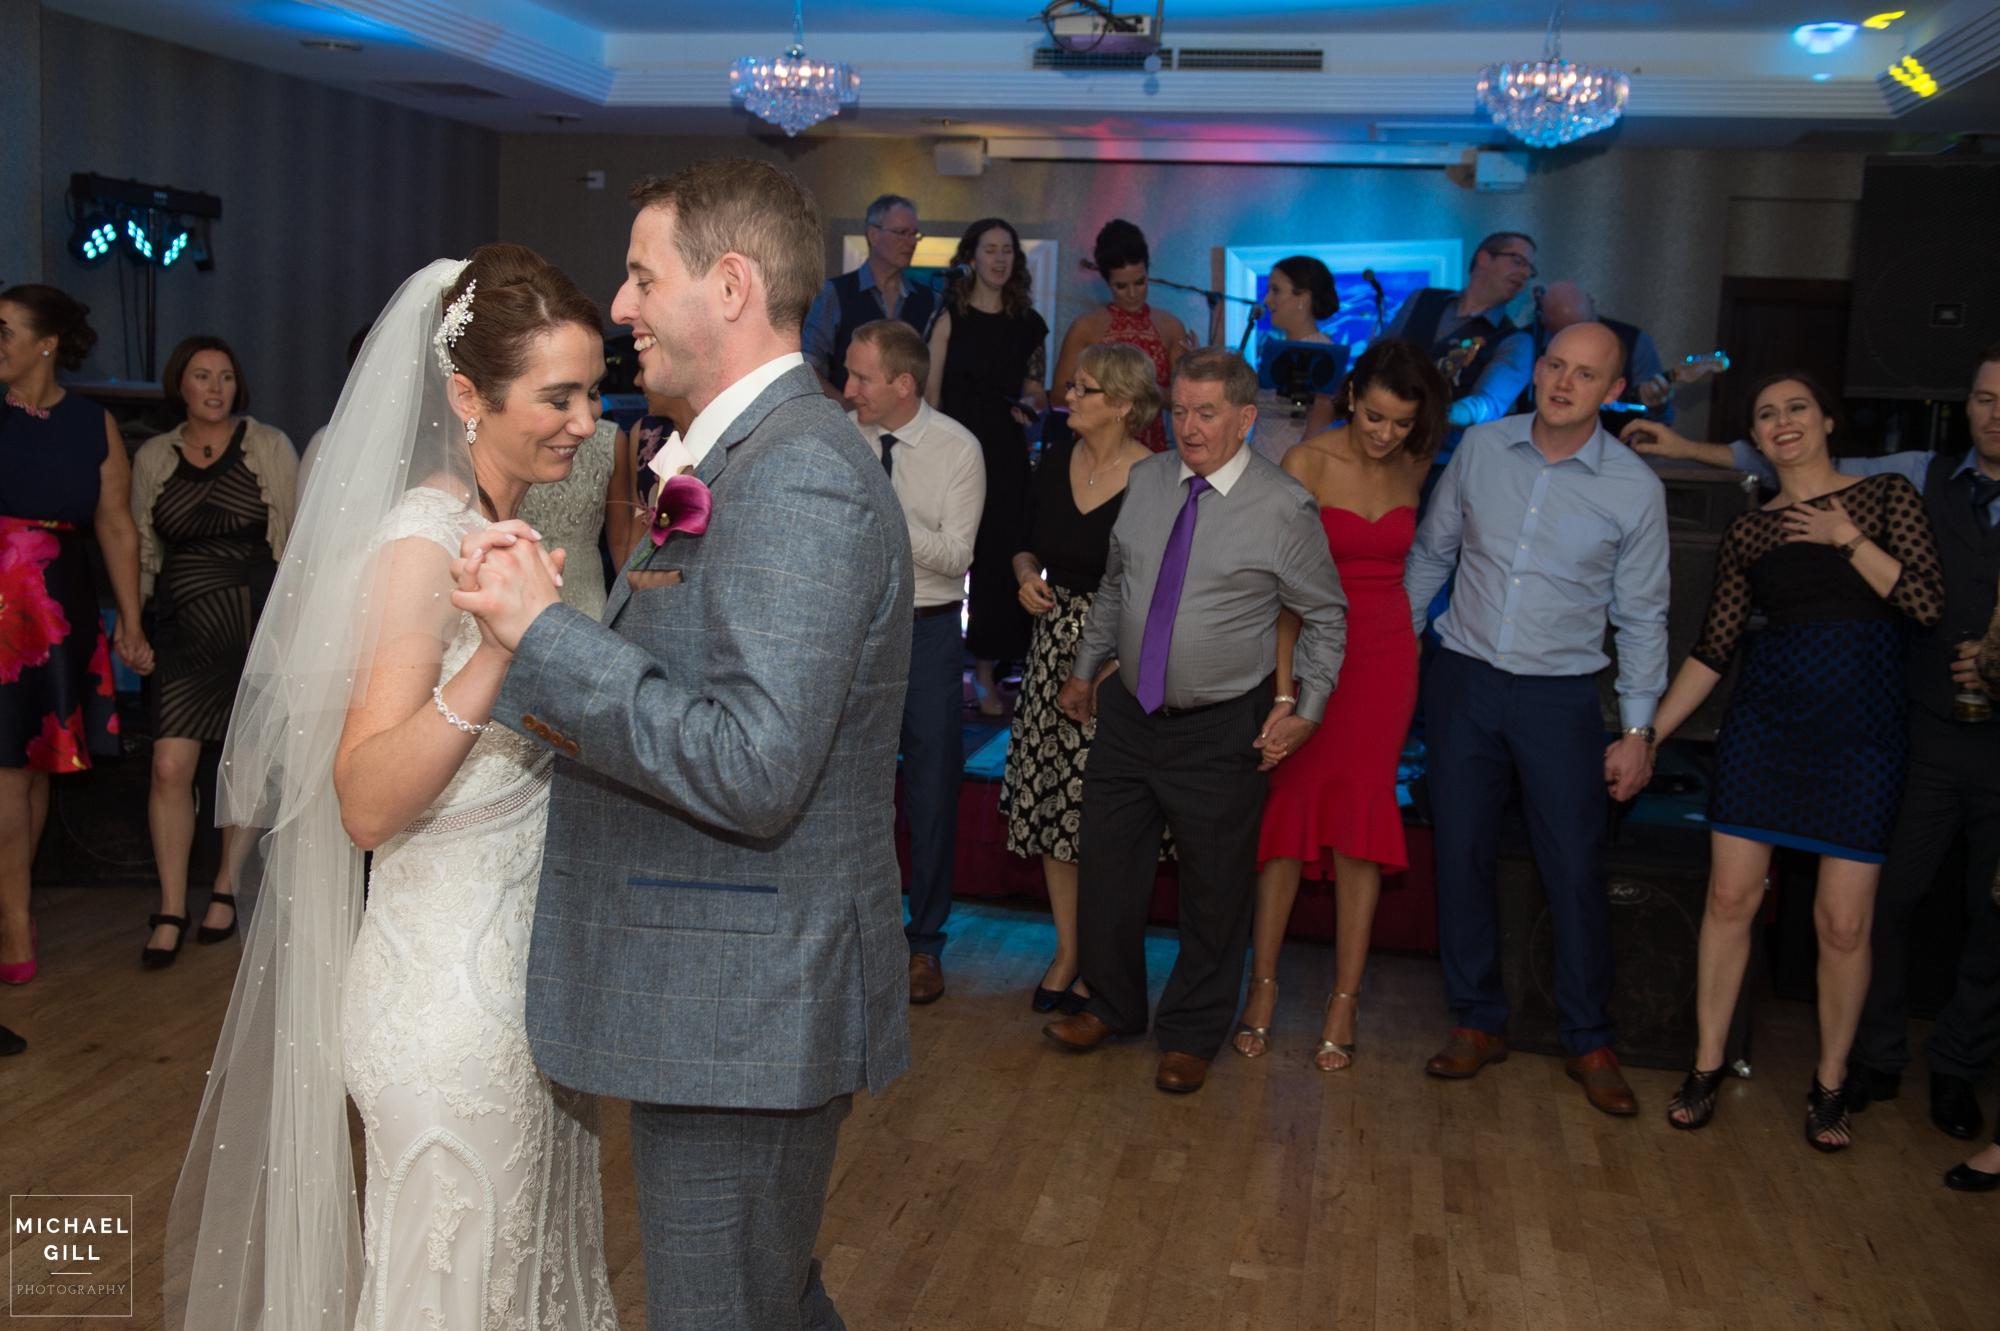 Michael_Gill_Photography_Kinnego_Redcastle_Hotel_Wedding2 (1).jpg